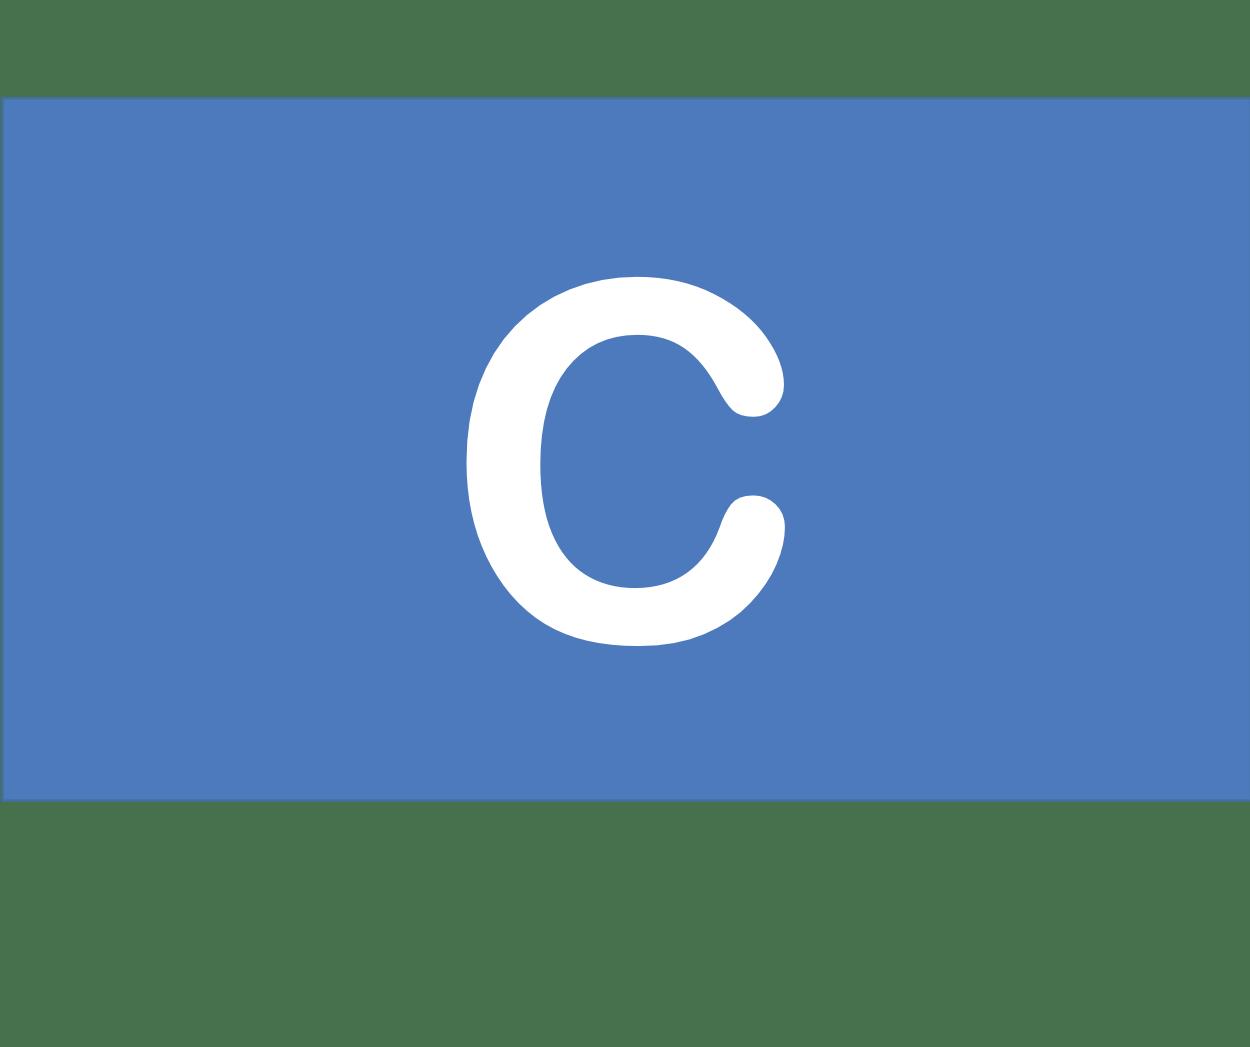 6 C 炭素 Carbon 元素 記号 周期表 化学 原子